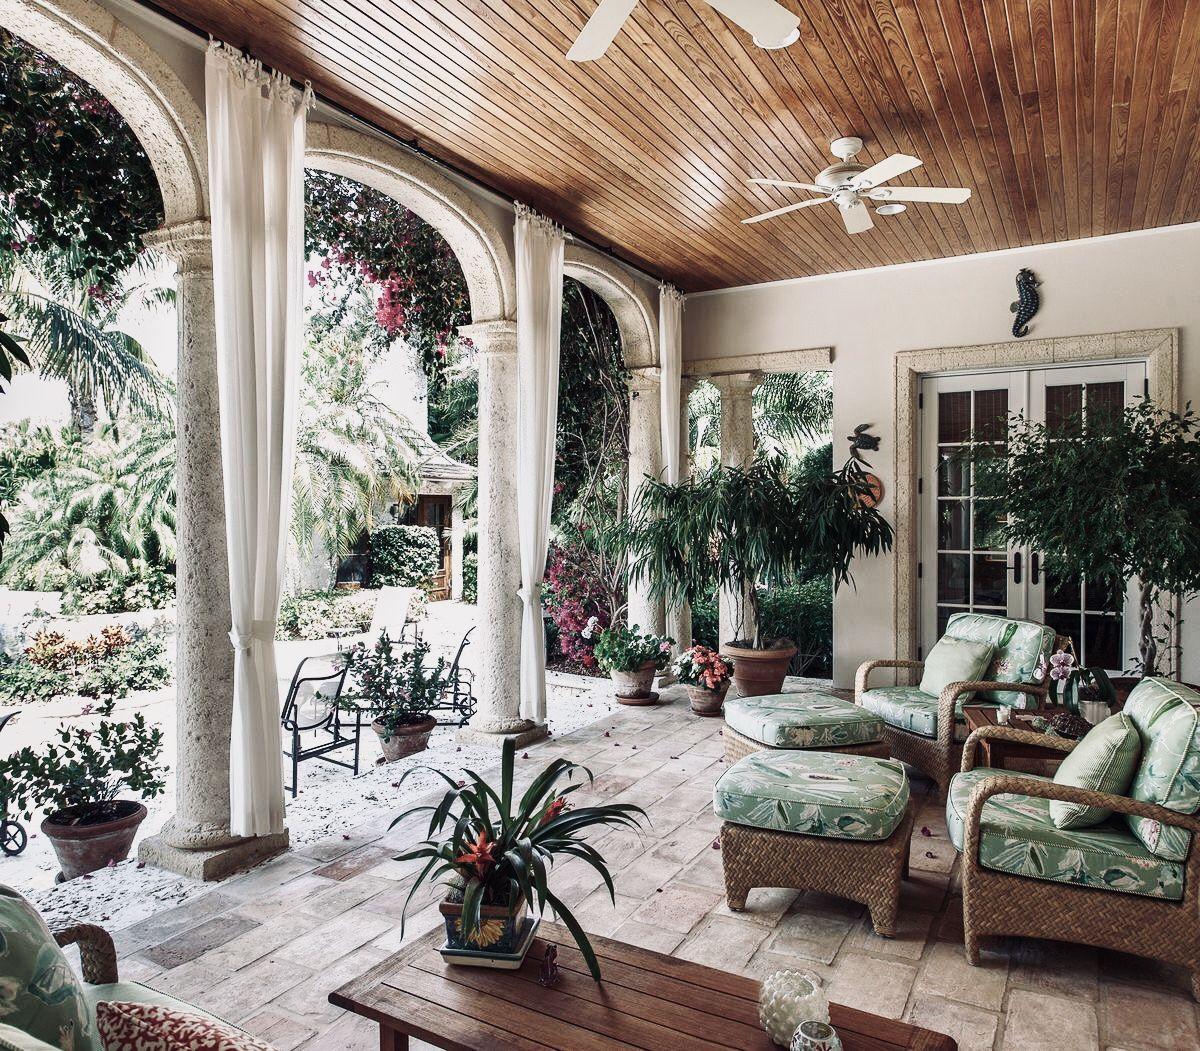 Take2t00 Patio Outdoor Rooms Lanai Decorating